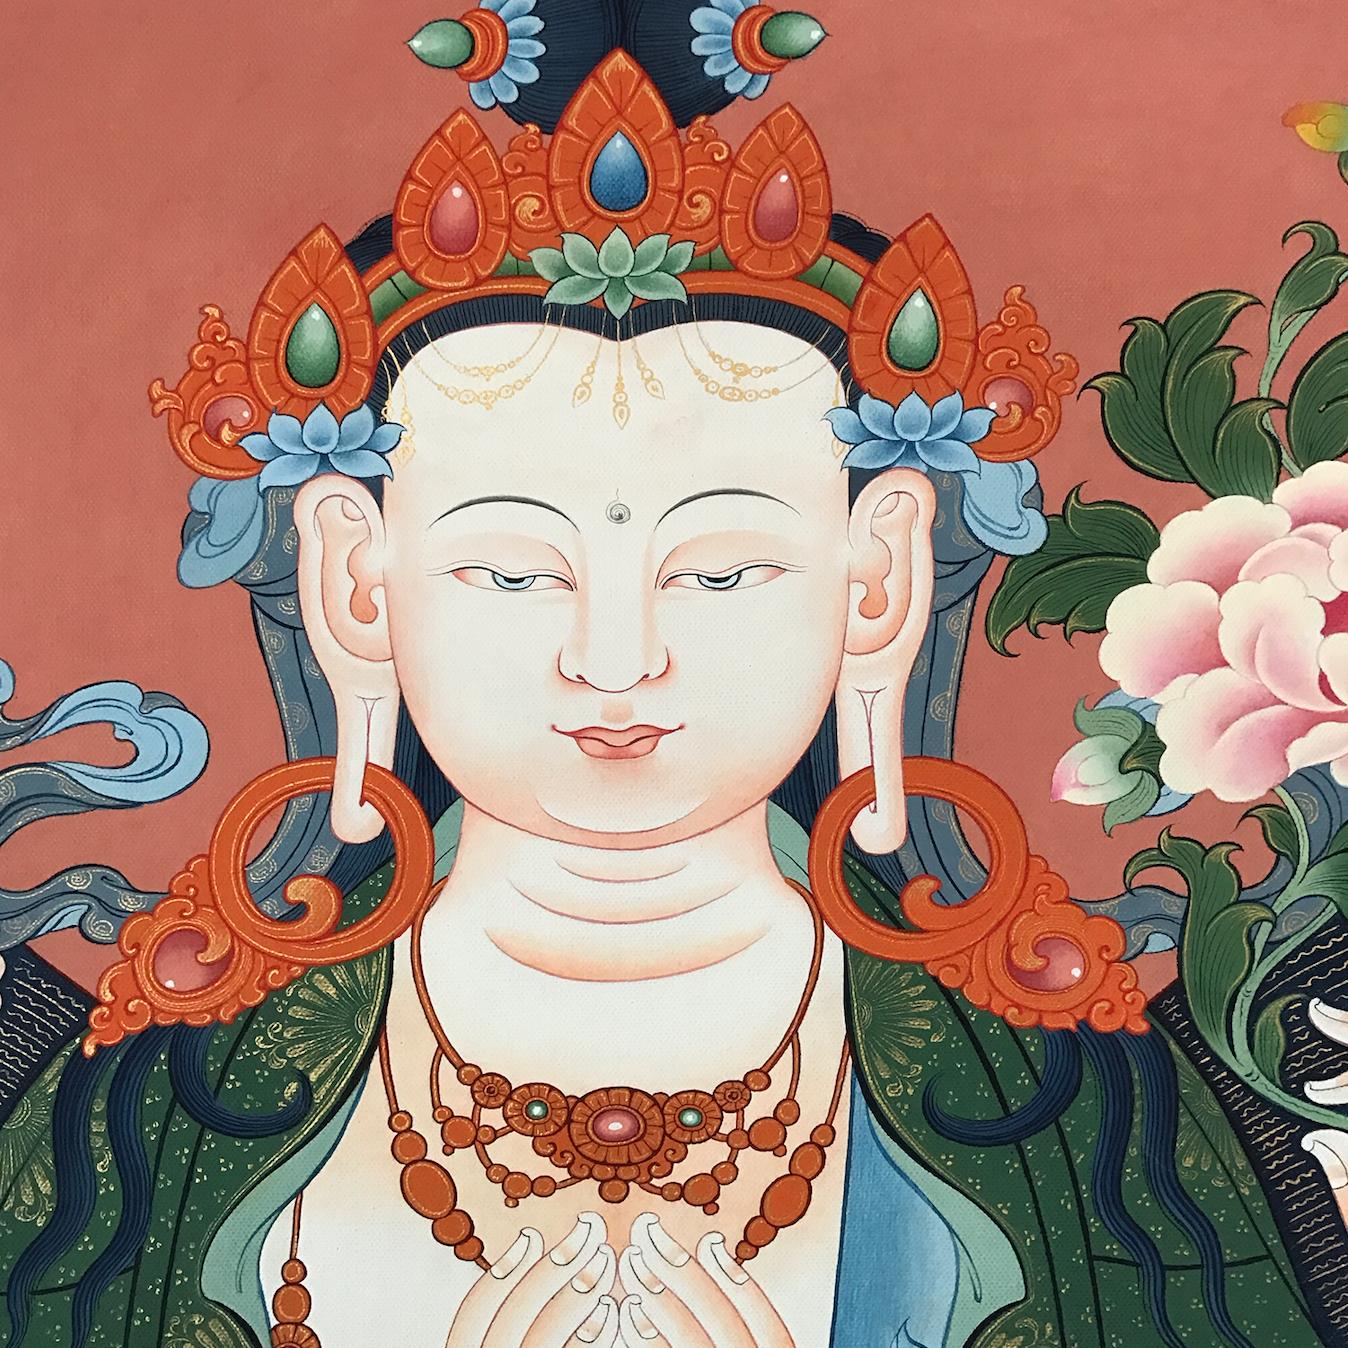 Face detail: Avalokiteśvara is known as Chenrezig, སྤྱན་རས་གཟིགས་ and is said to be incarnated as the Dalai Lama,the Karma and other high lamas. #ColoringForMeditation #TibetanArt #TibetanColoring #Thangka #BuddhistArt #BuddhistColoring